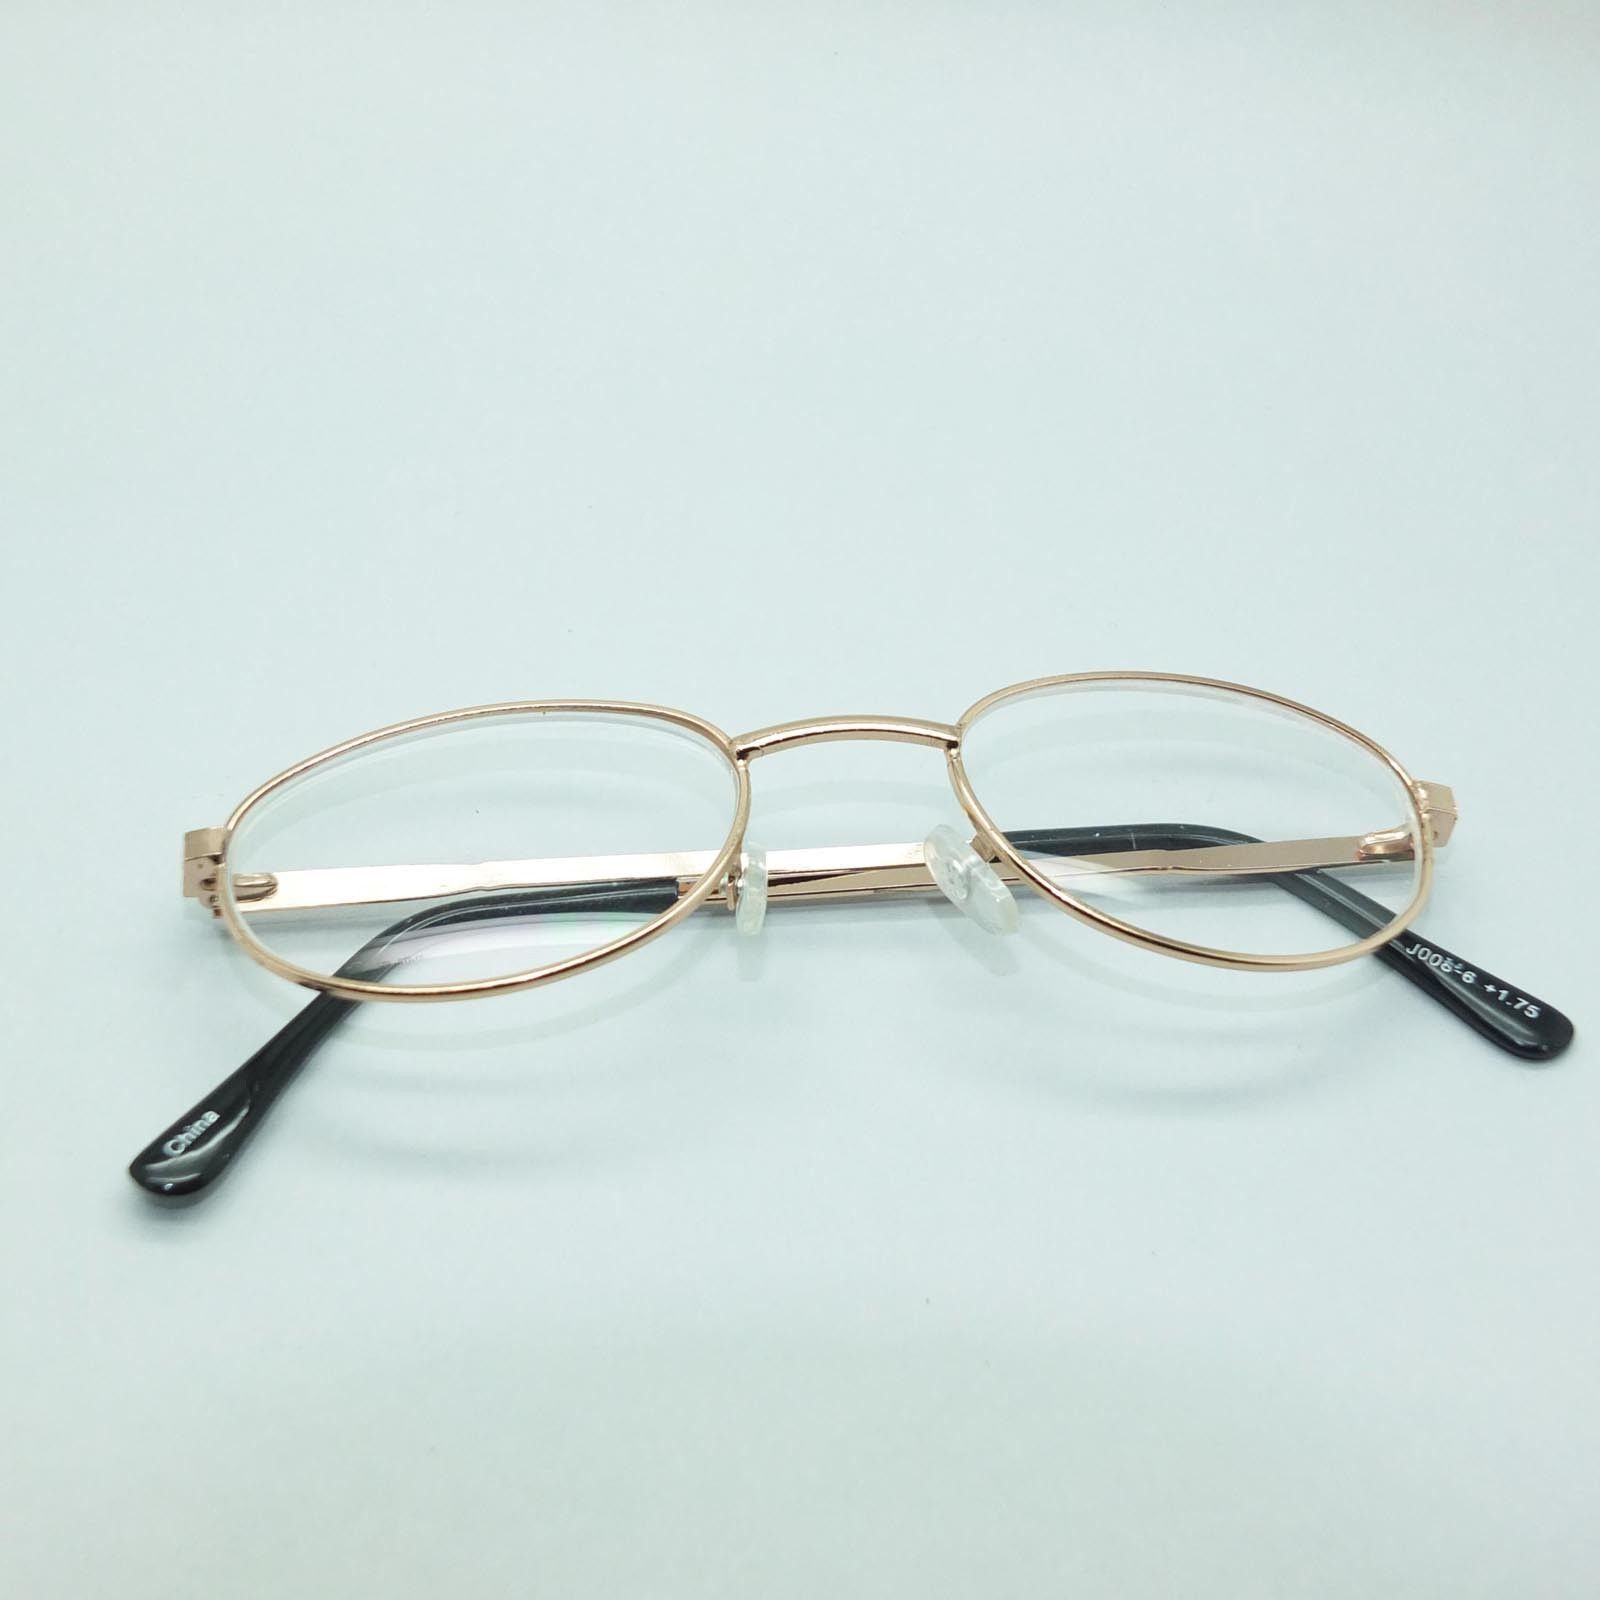 3ebf2f3fdb Super Petite Delicate Lightweight Reading Glasses Gold Metal Frame +2.50  Lens